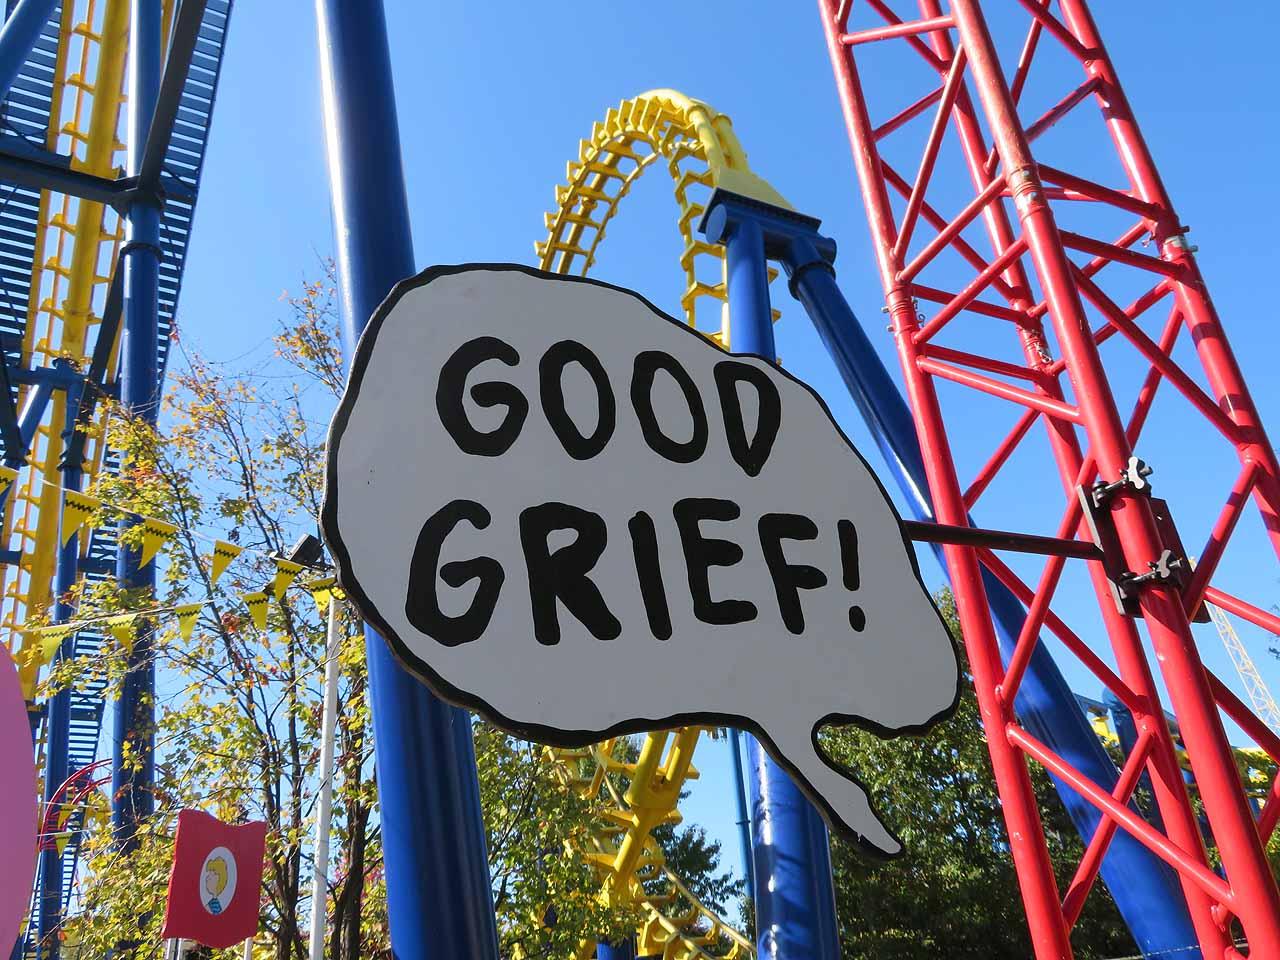 Carowinds Calendar 2022.Carowinds Kings Dominion Valleyfair California S Great America To Remain Closed For 2020 More Cedar Fair Updates Coaster101